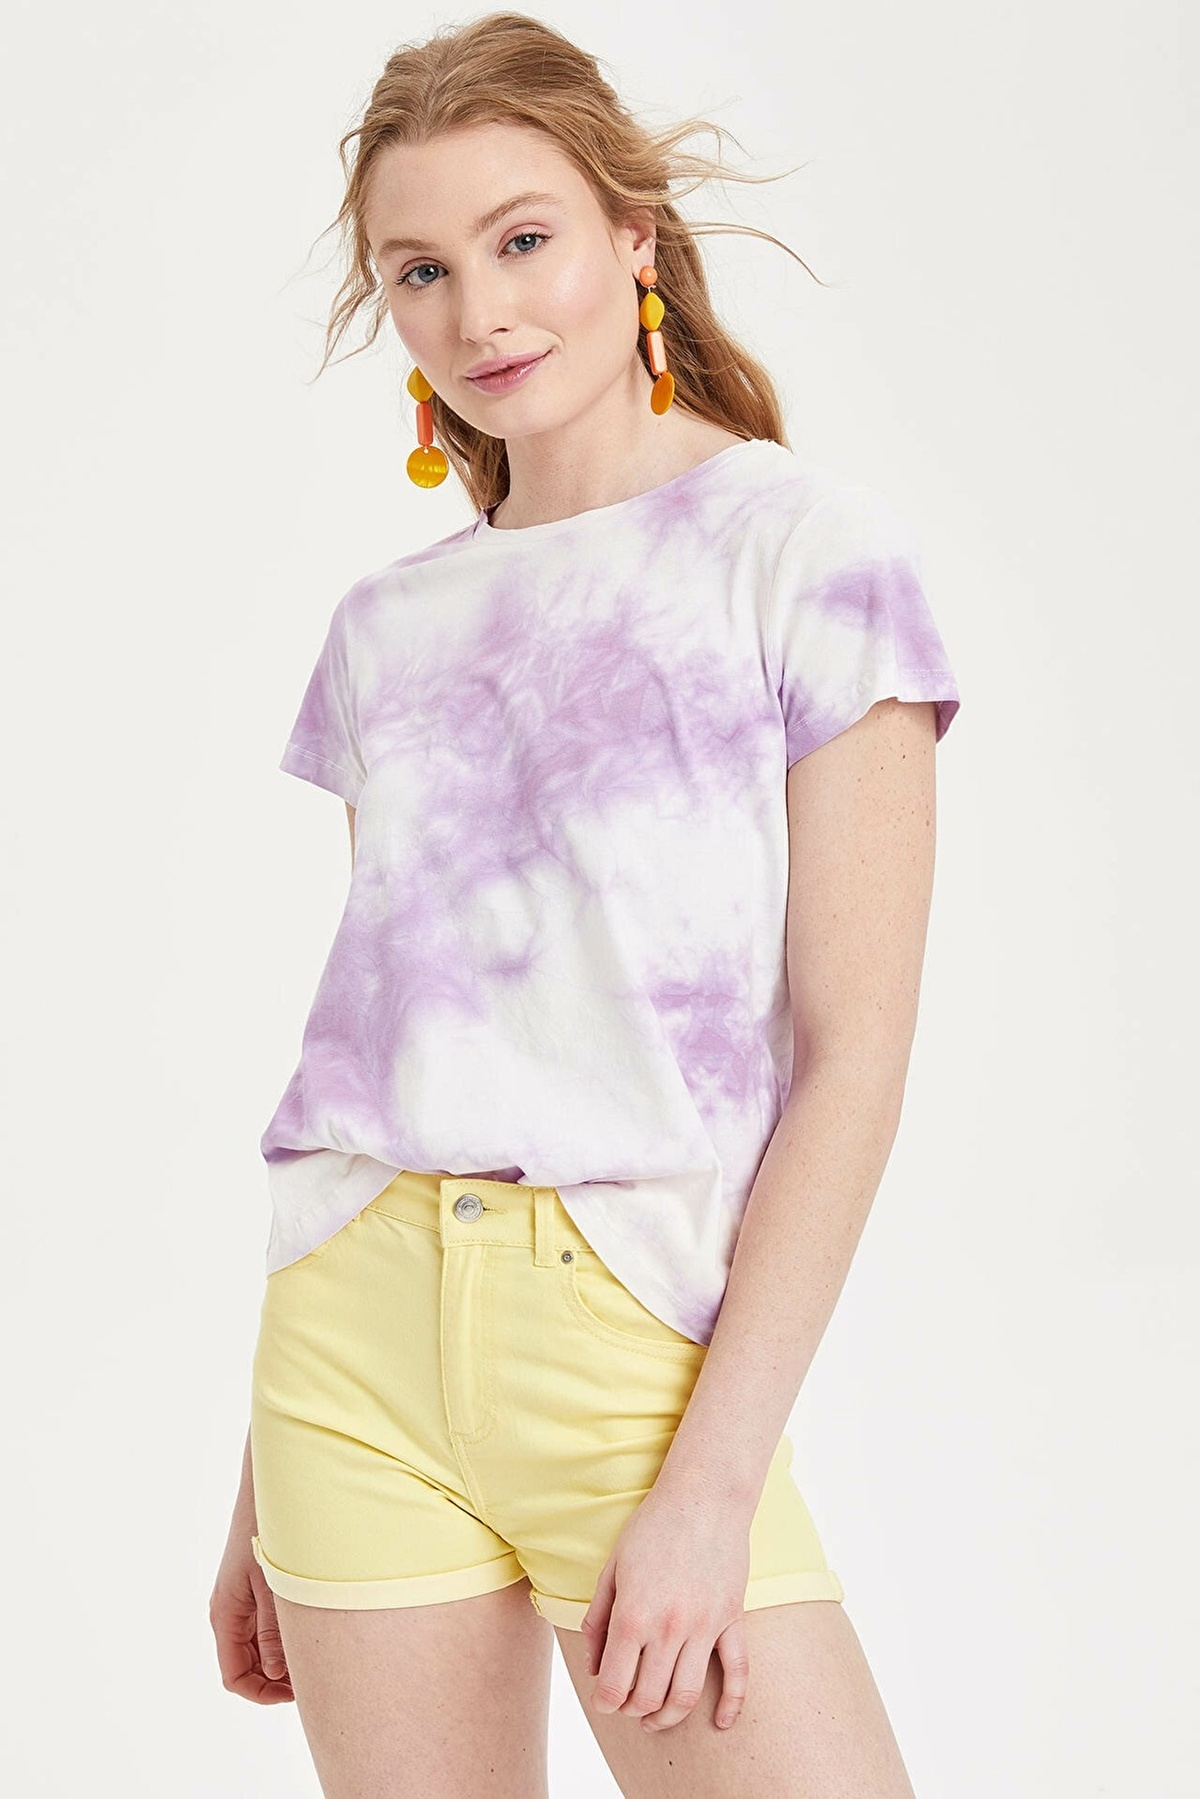 Defacto Tişört L4537az19smpn4t-shirt – 35.99 TL